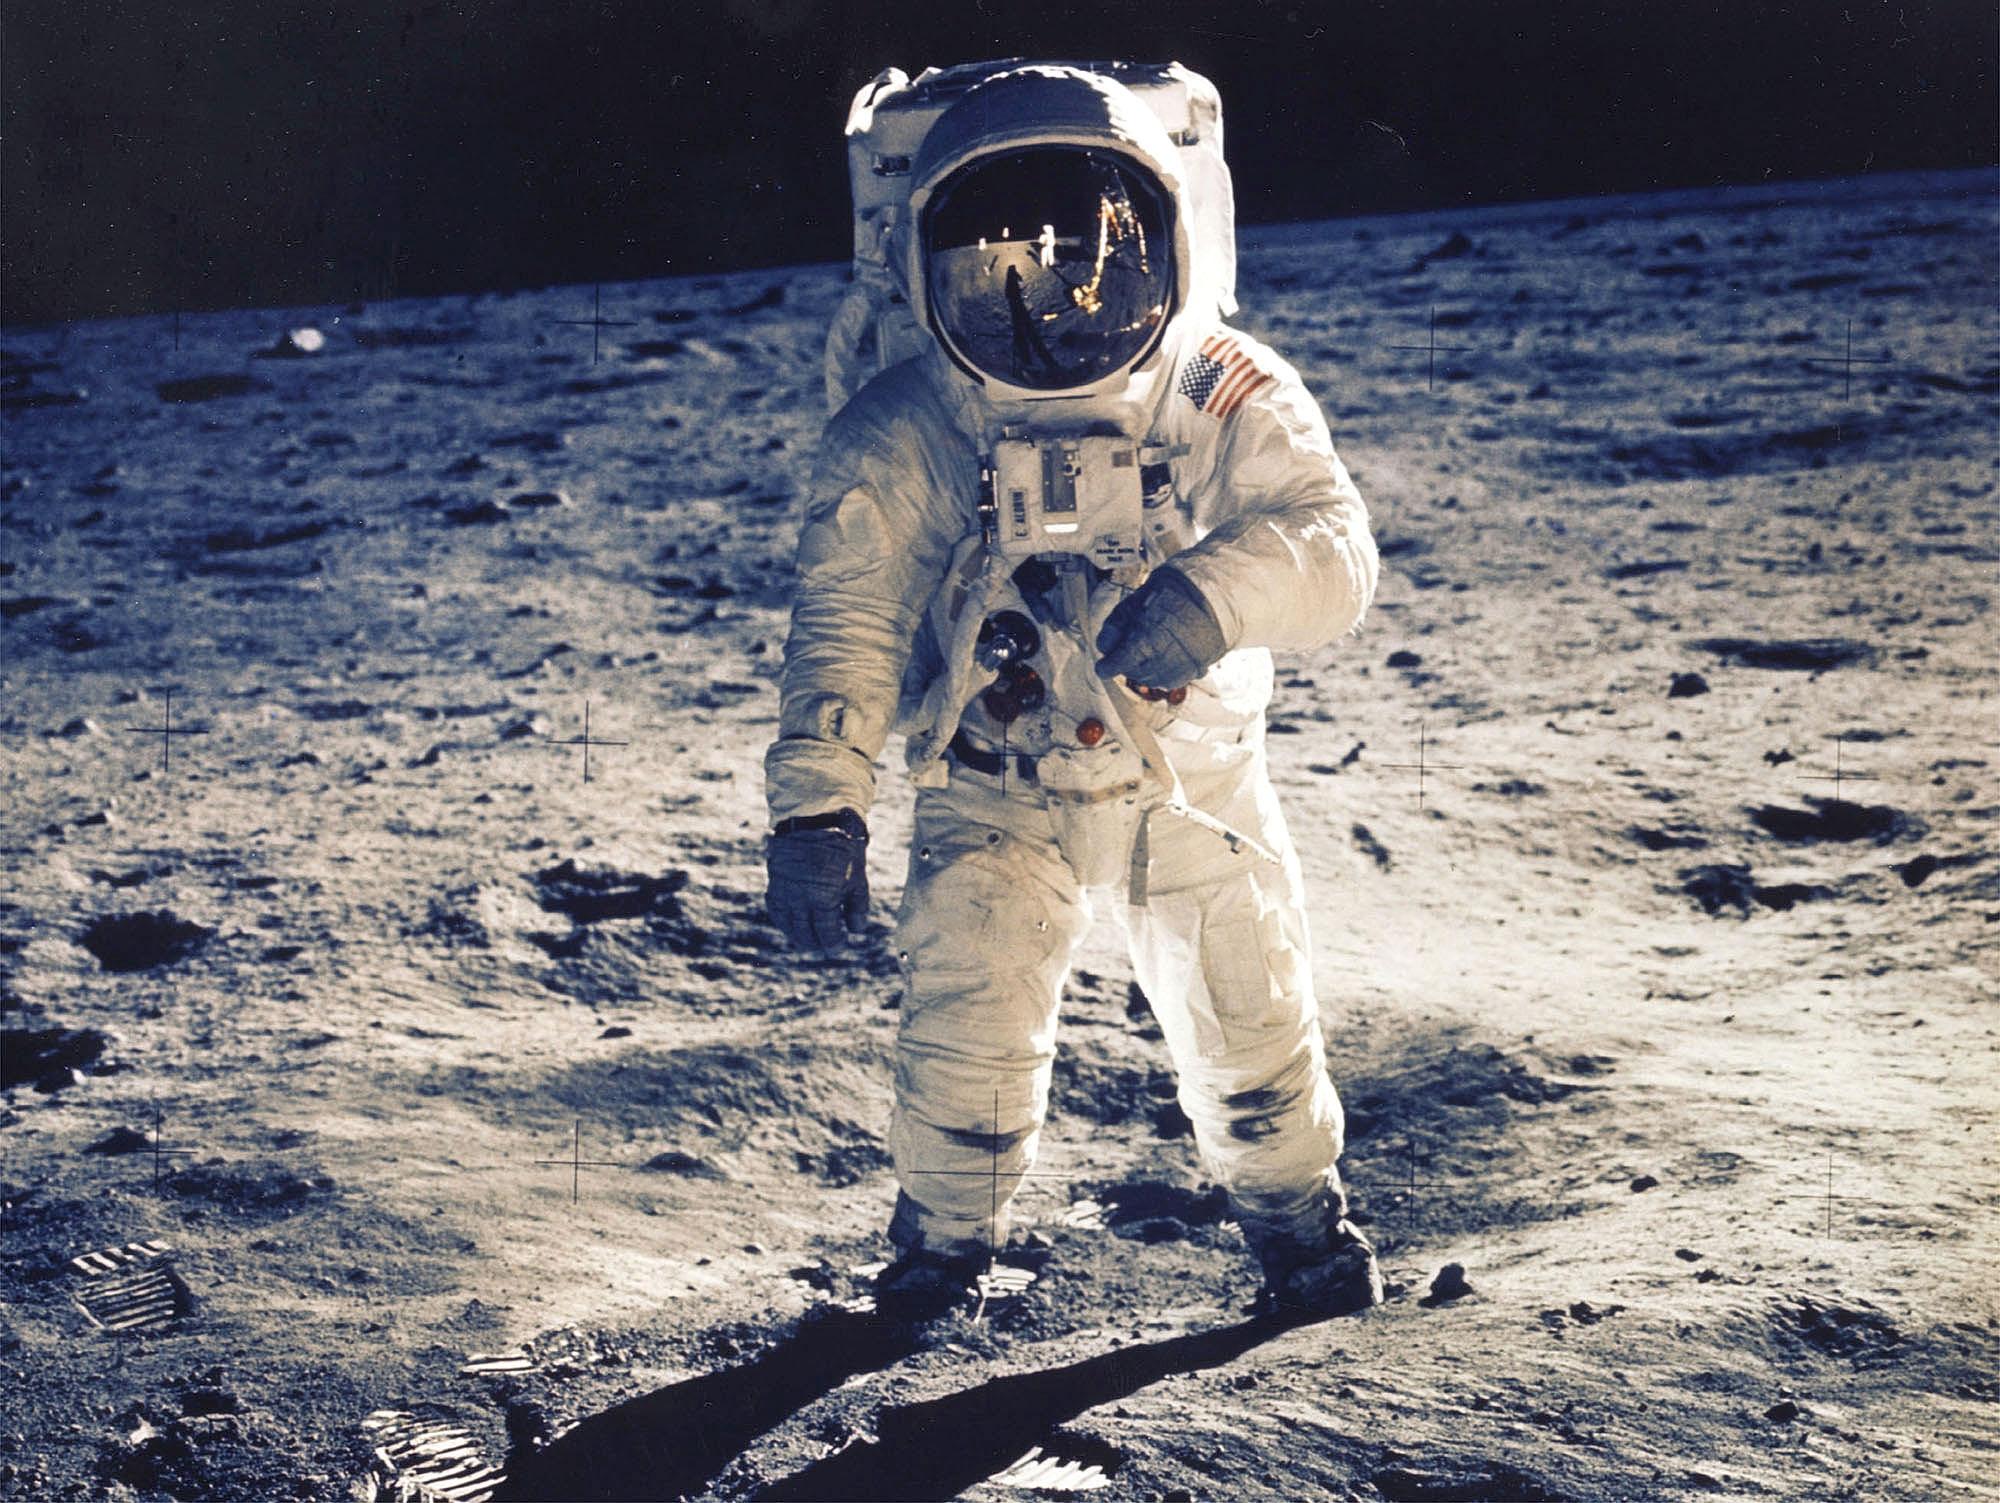 Apollo Moon Landing Anniversary Celebrated in SoCal